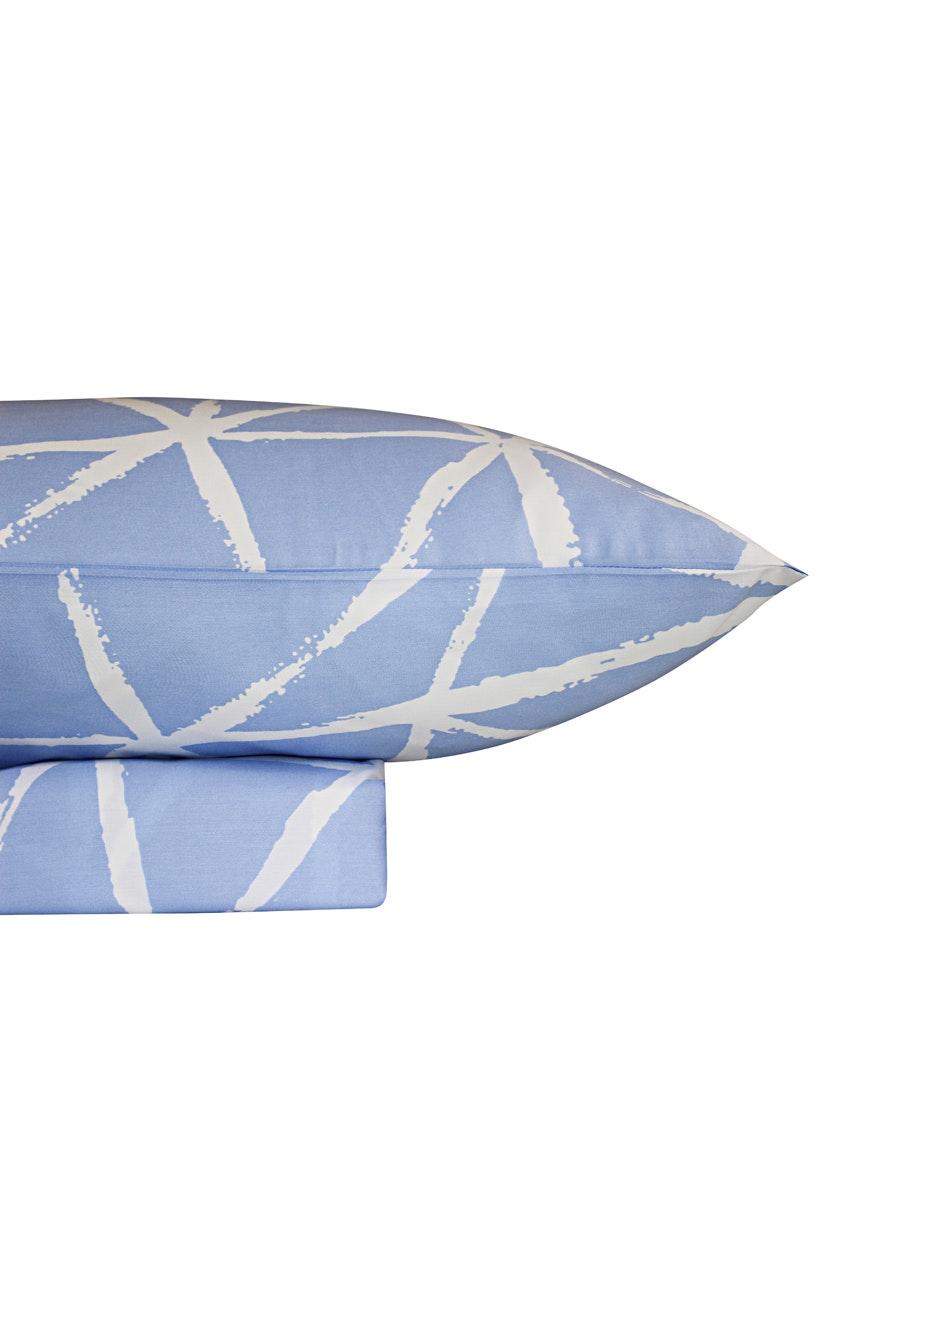 1000 Thread Count – Kyoto Print Sheet Sets -Bluebird - King Bed